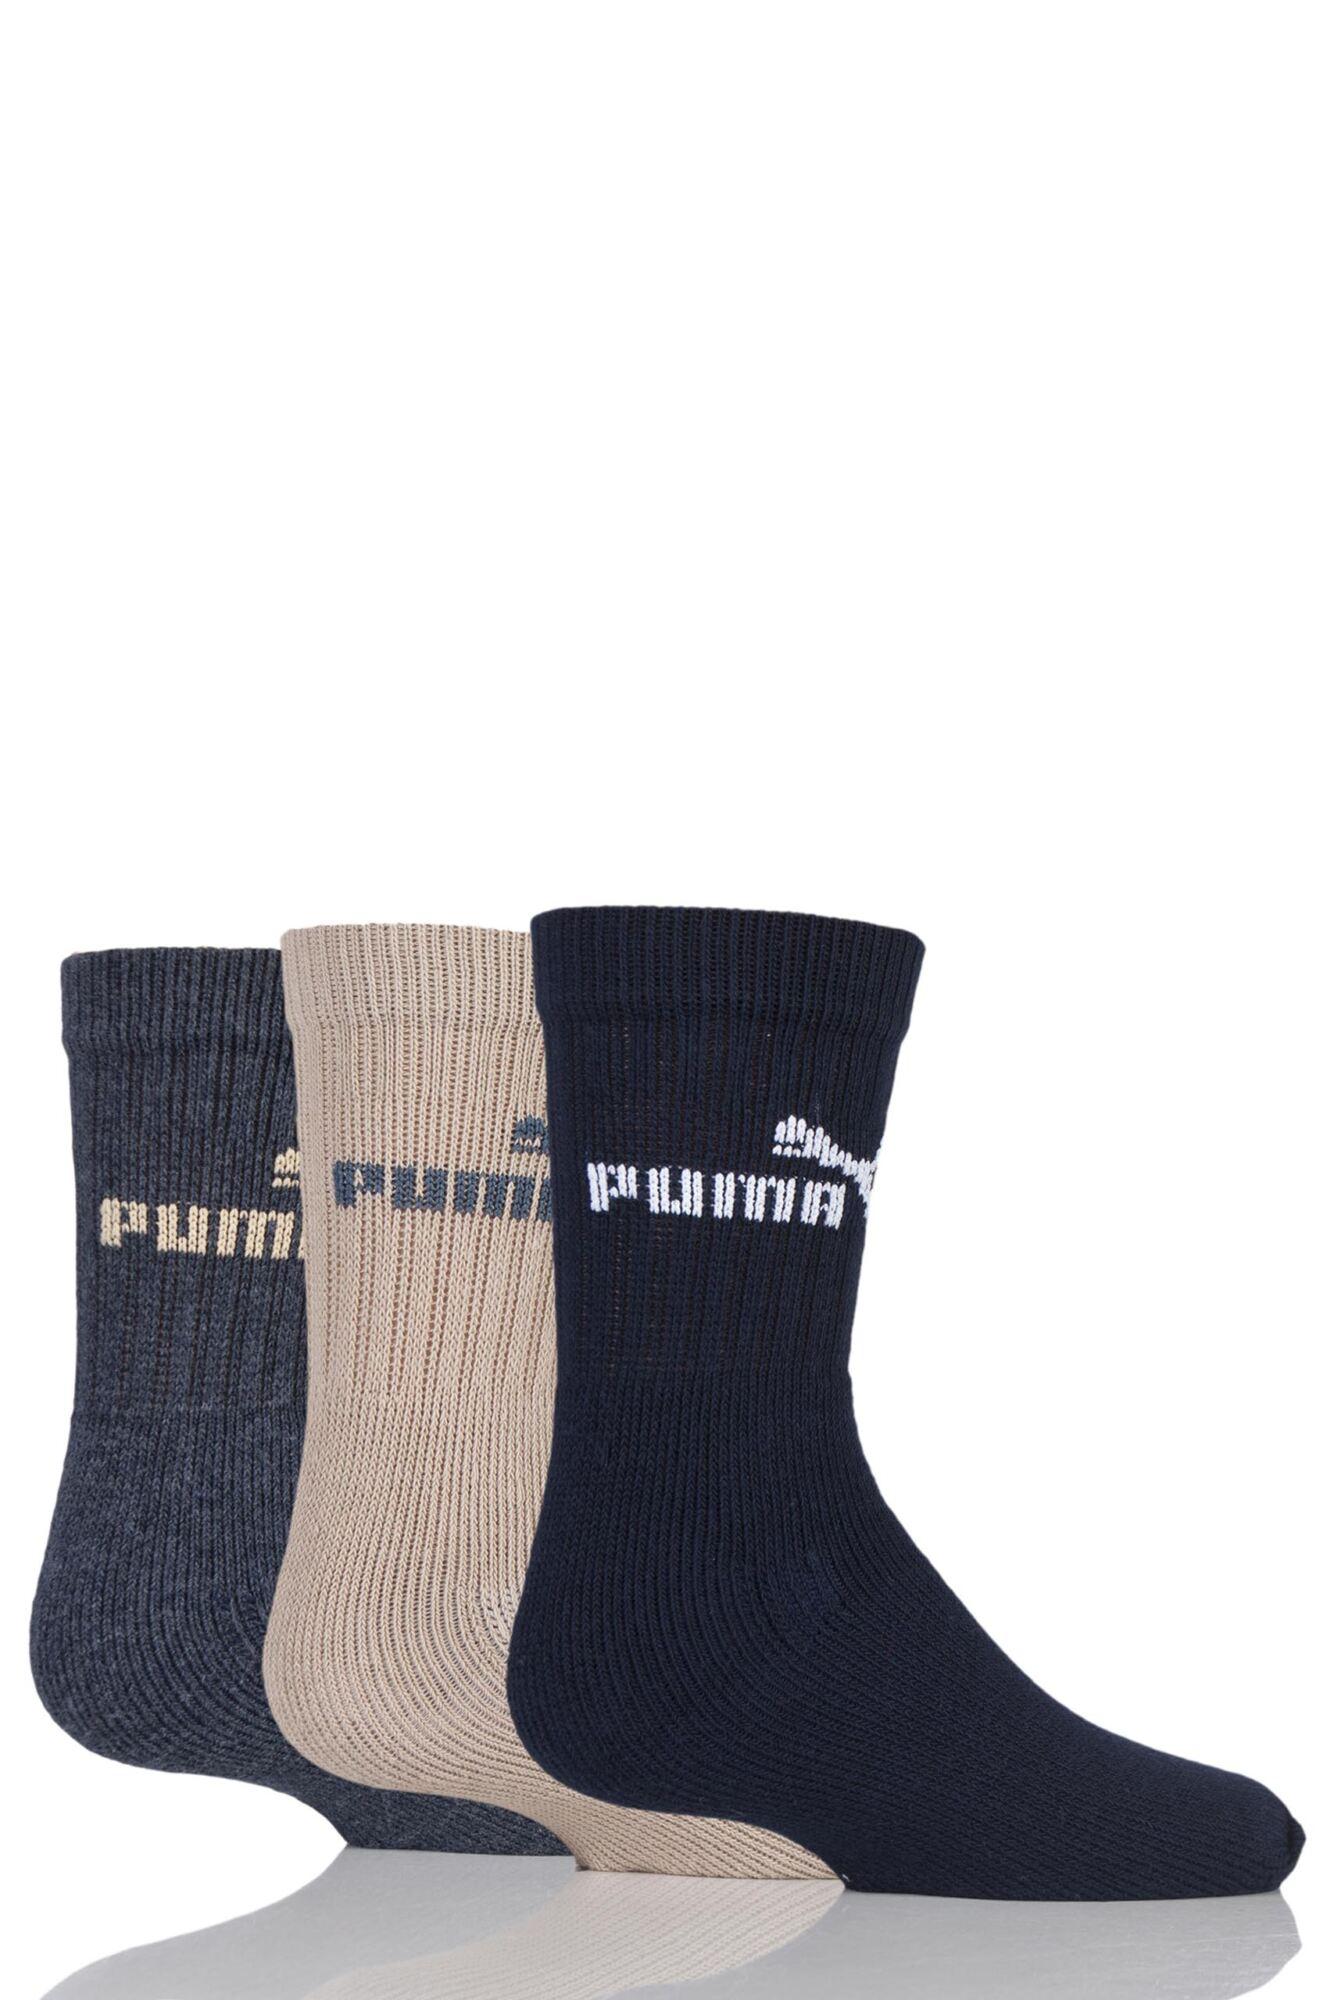 3 Pair Plain Crew Sports Socks Kids Unisex - Puma